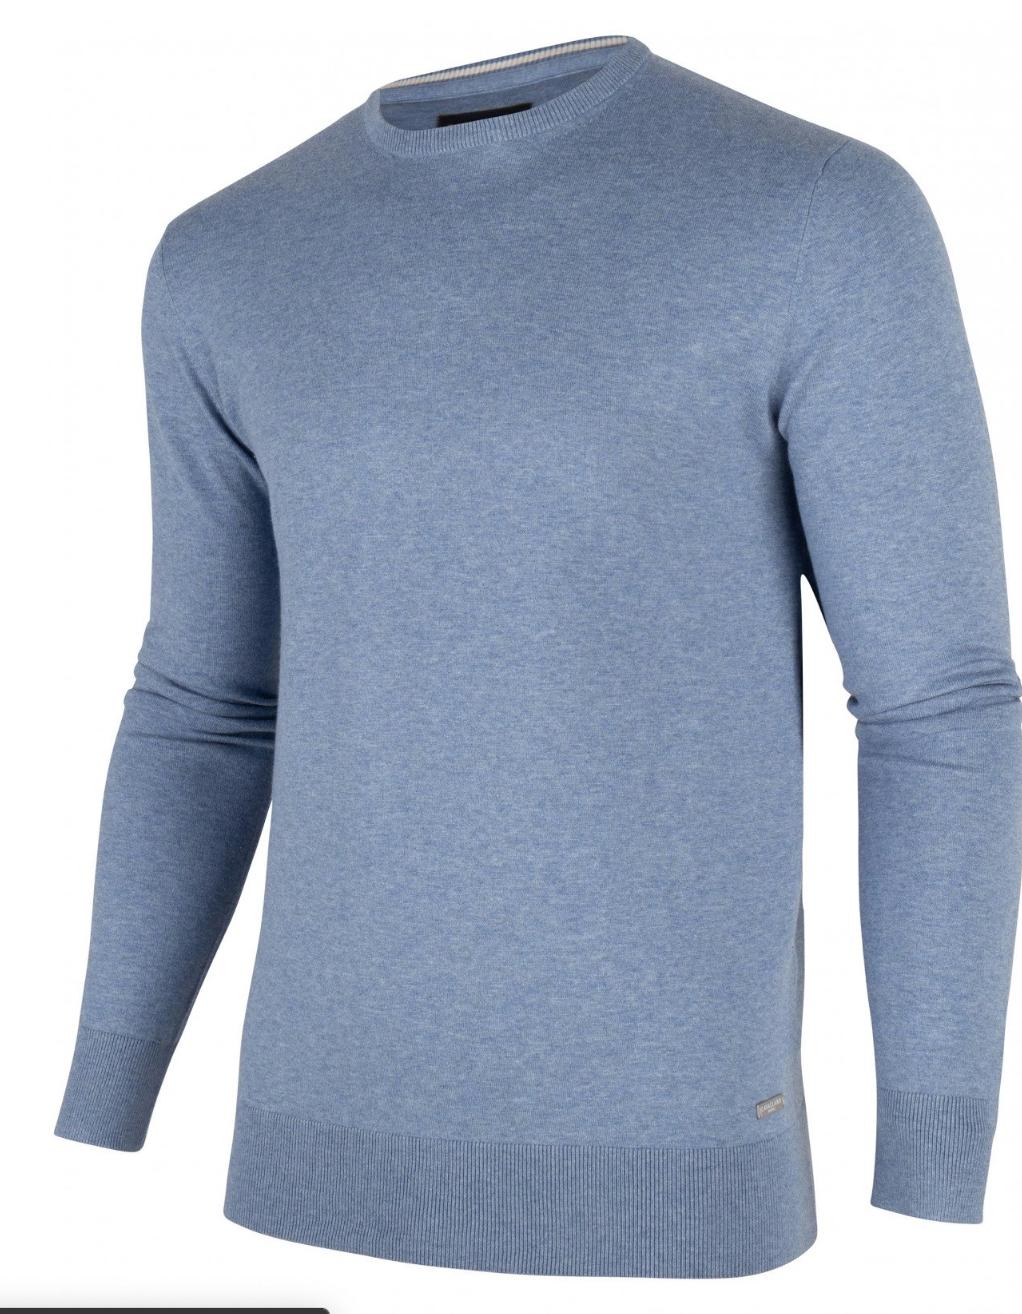 Tomasso r-neck pullover-1